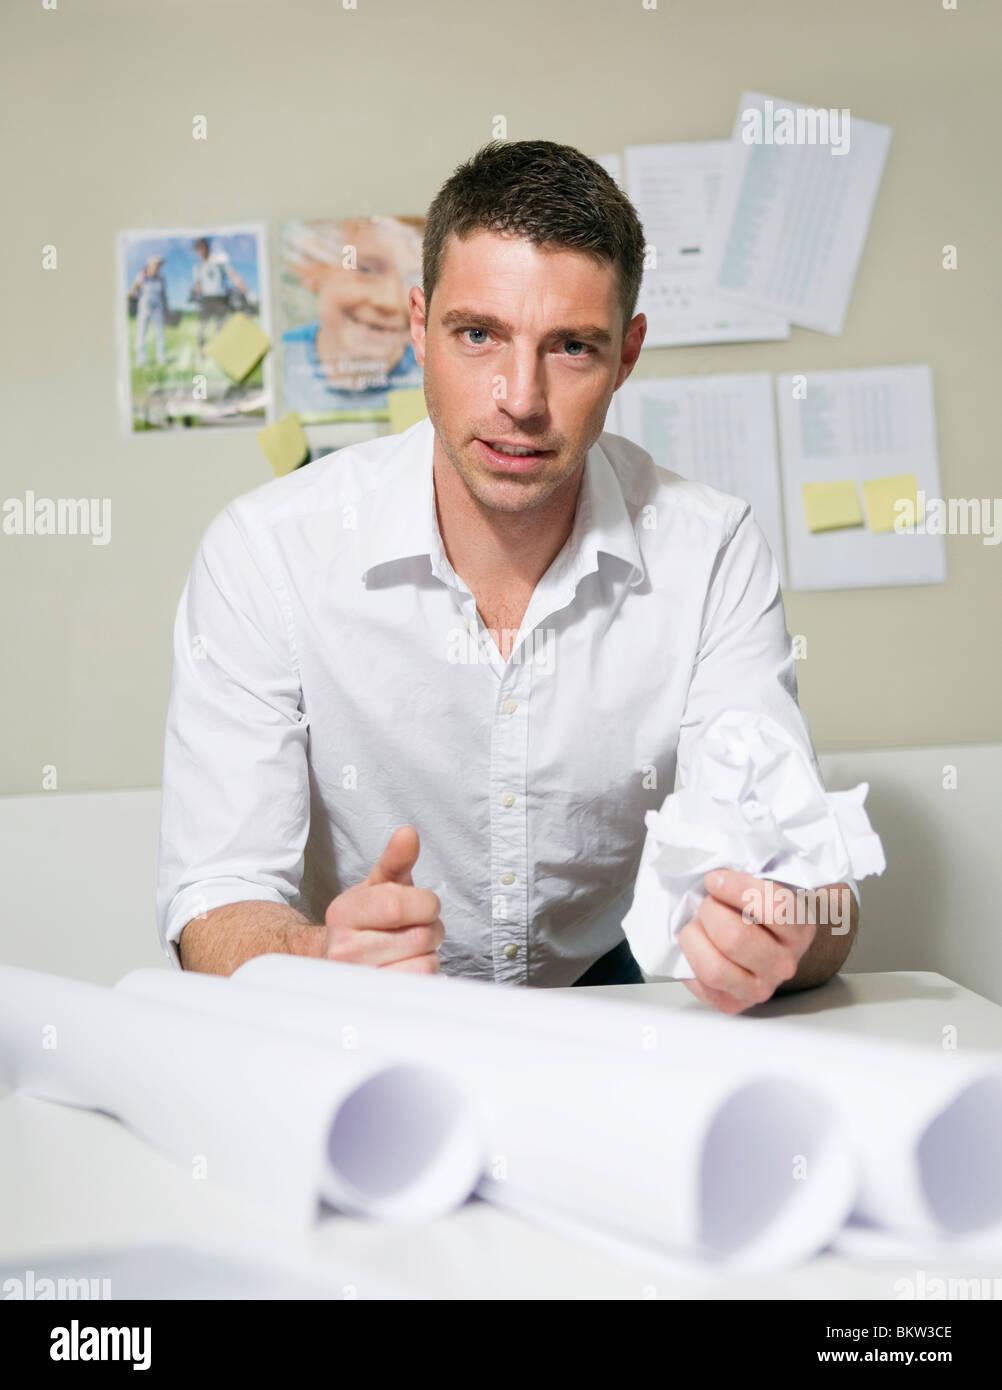 Man at desk show anger - Stock Image